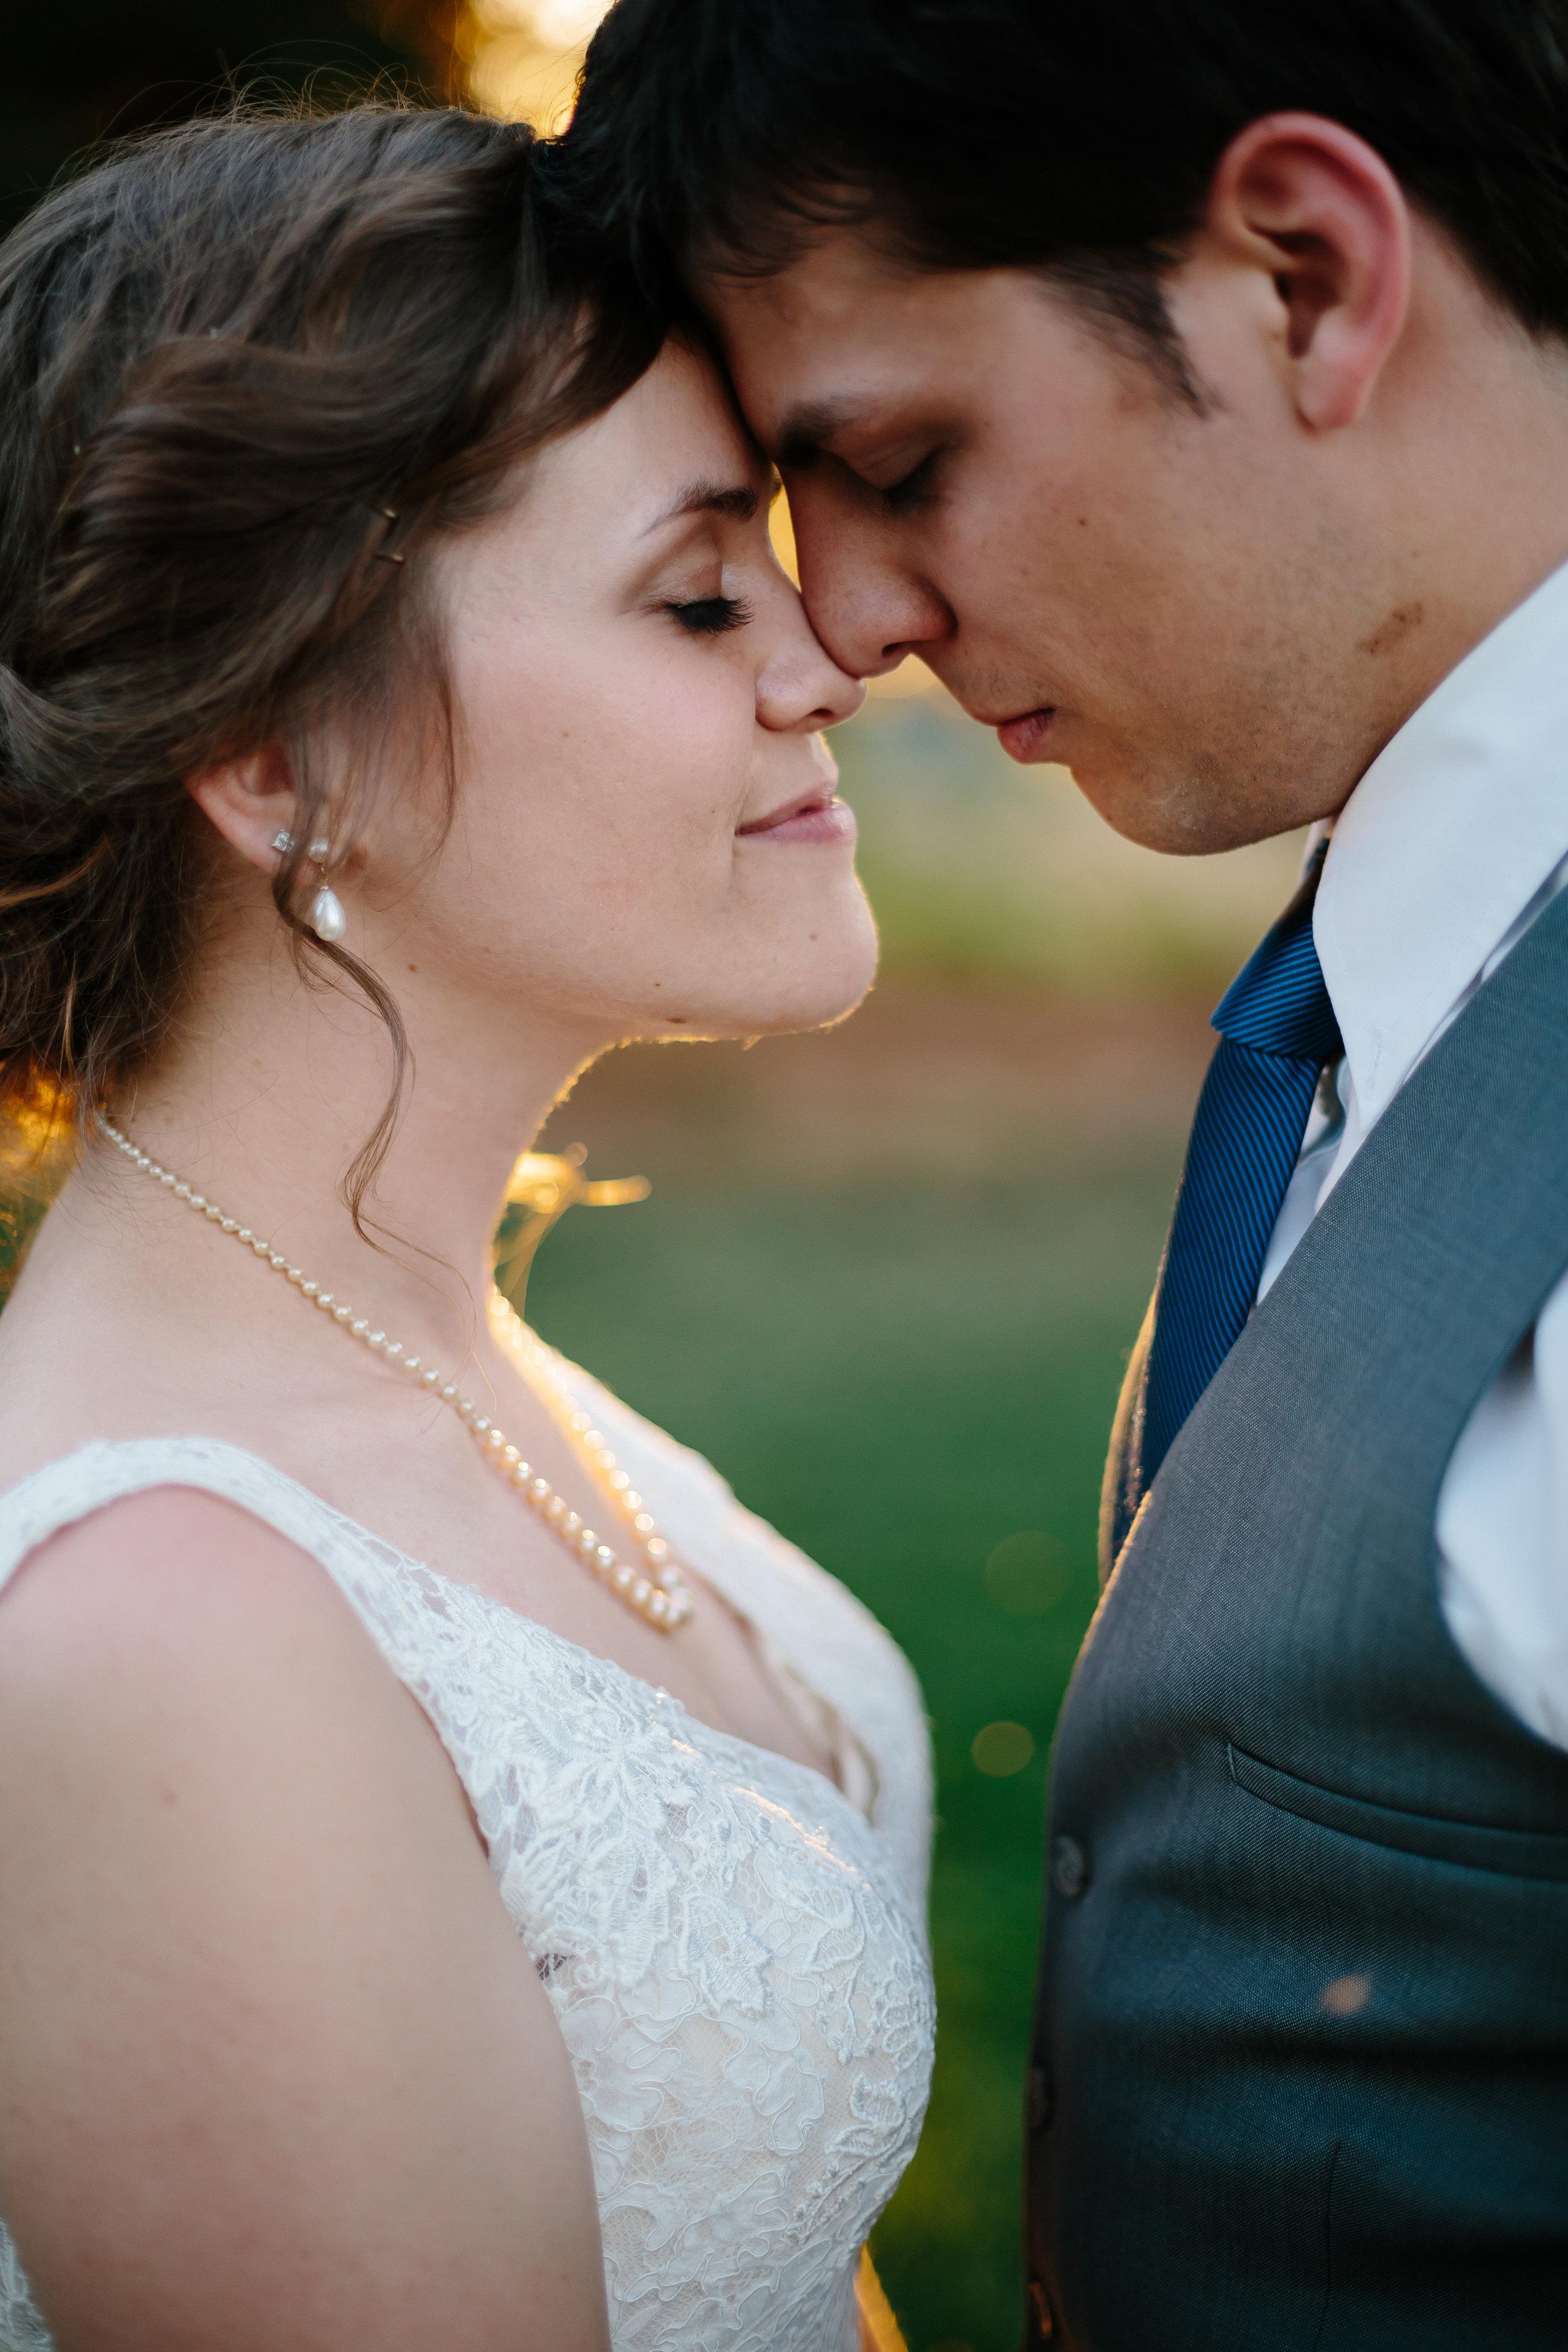 Jordan & Shantel Married - Idaho - Corrie Mick Photography-189.jpg